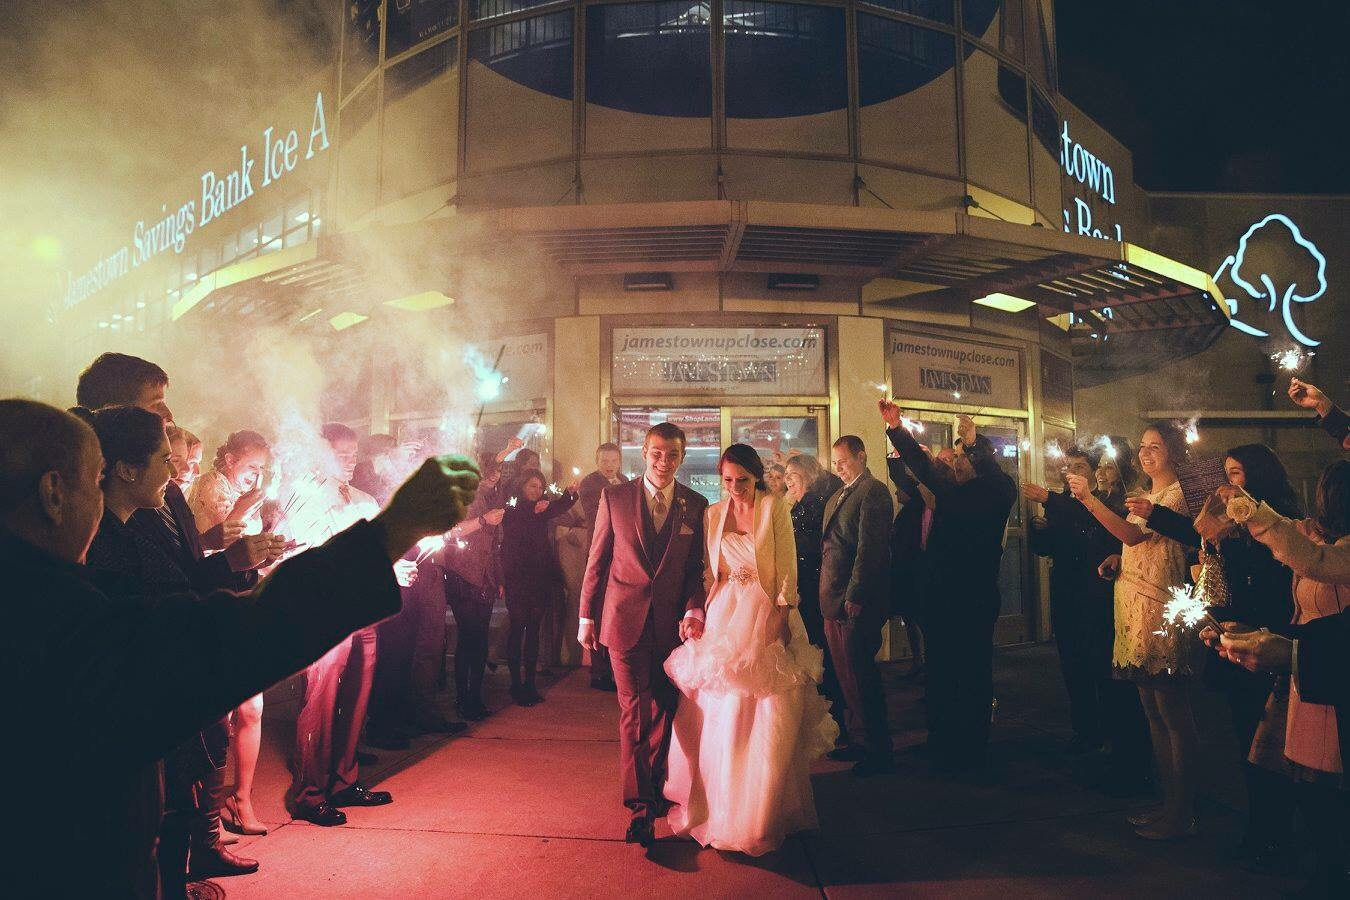 katie_graham_photography_light_in_the_dark_photography_winter_wedding_stress_free_wedding_planning